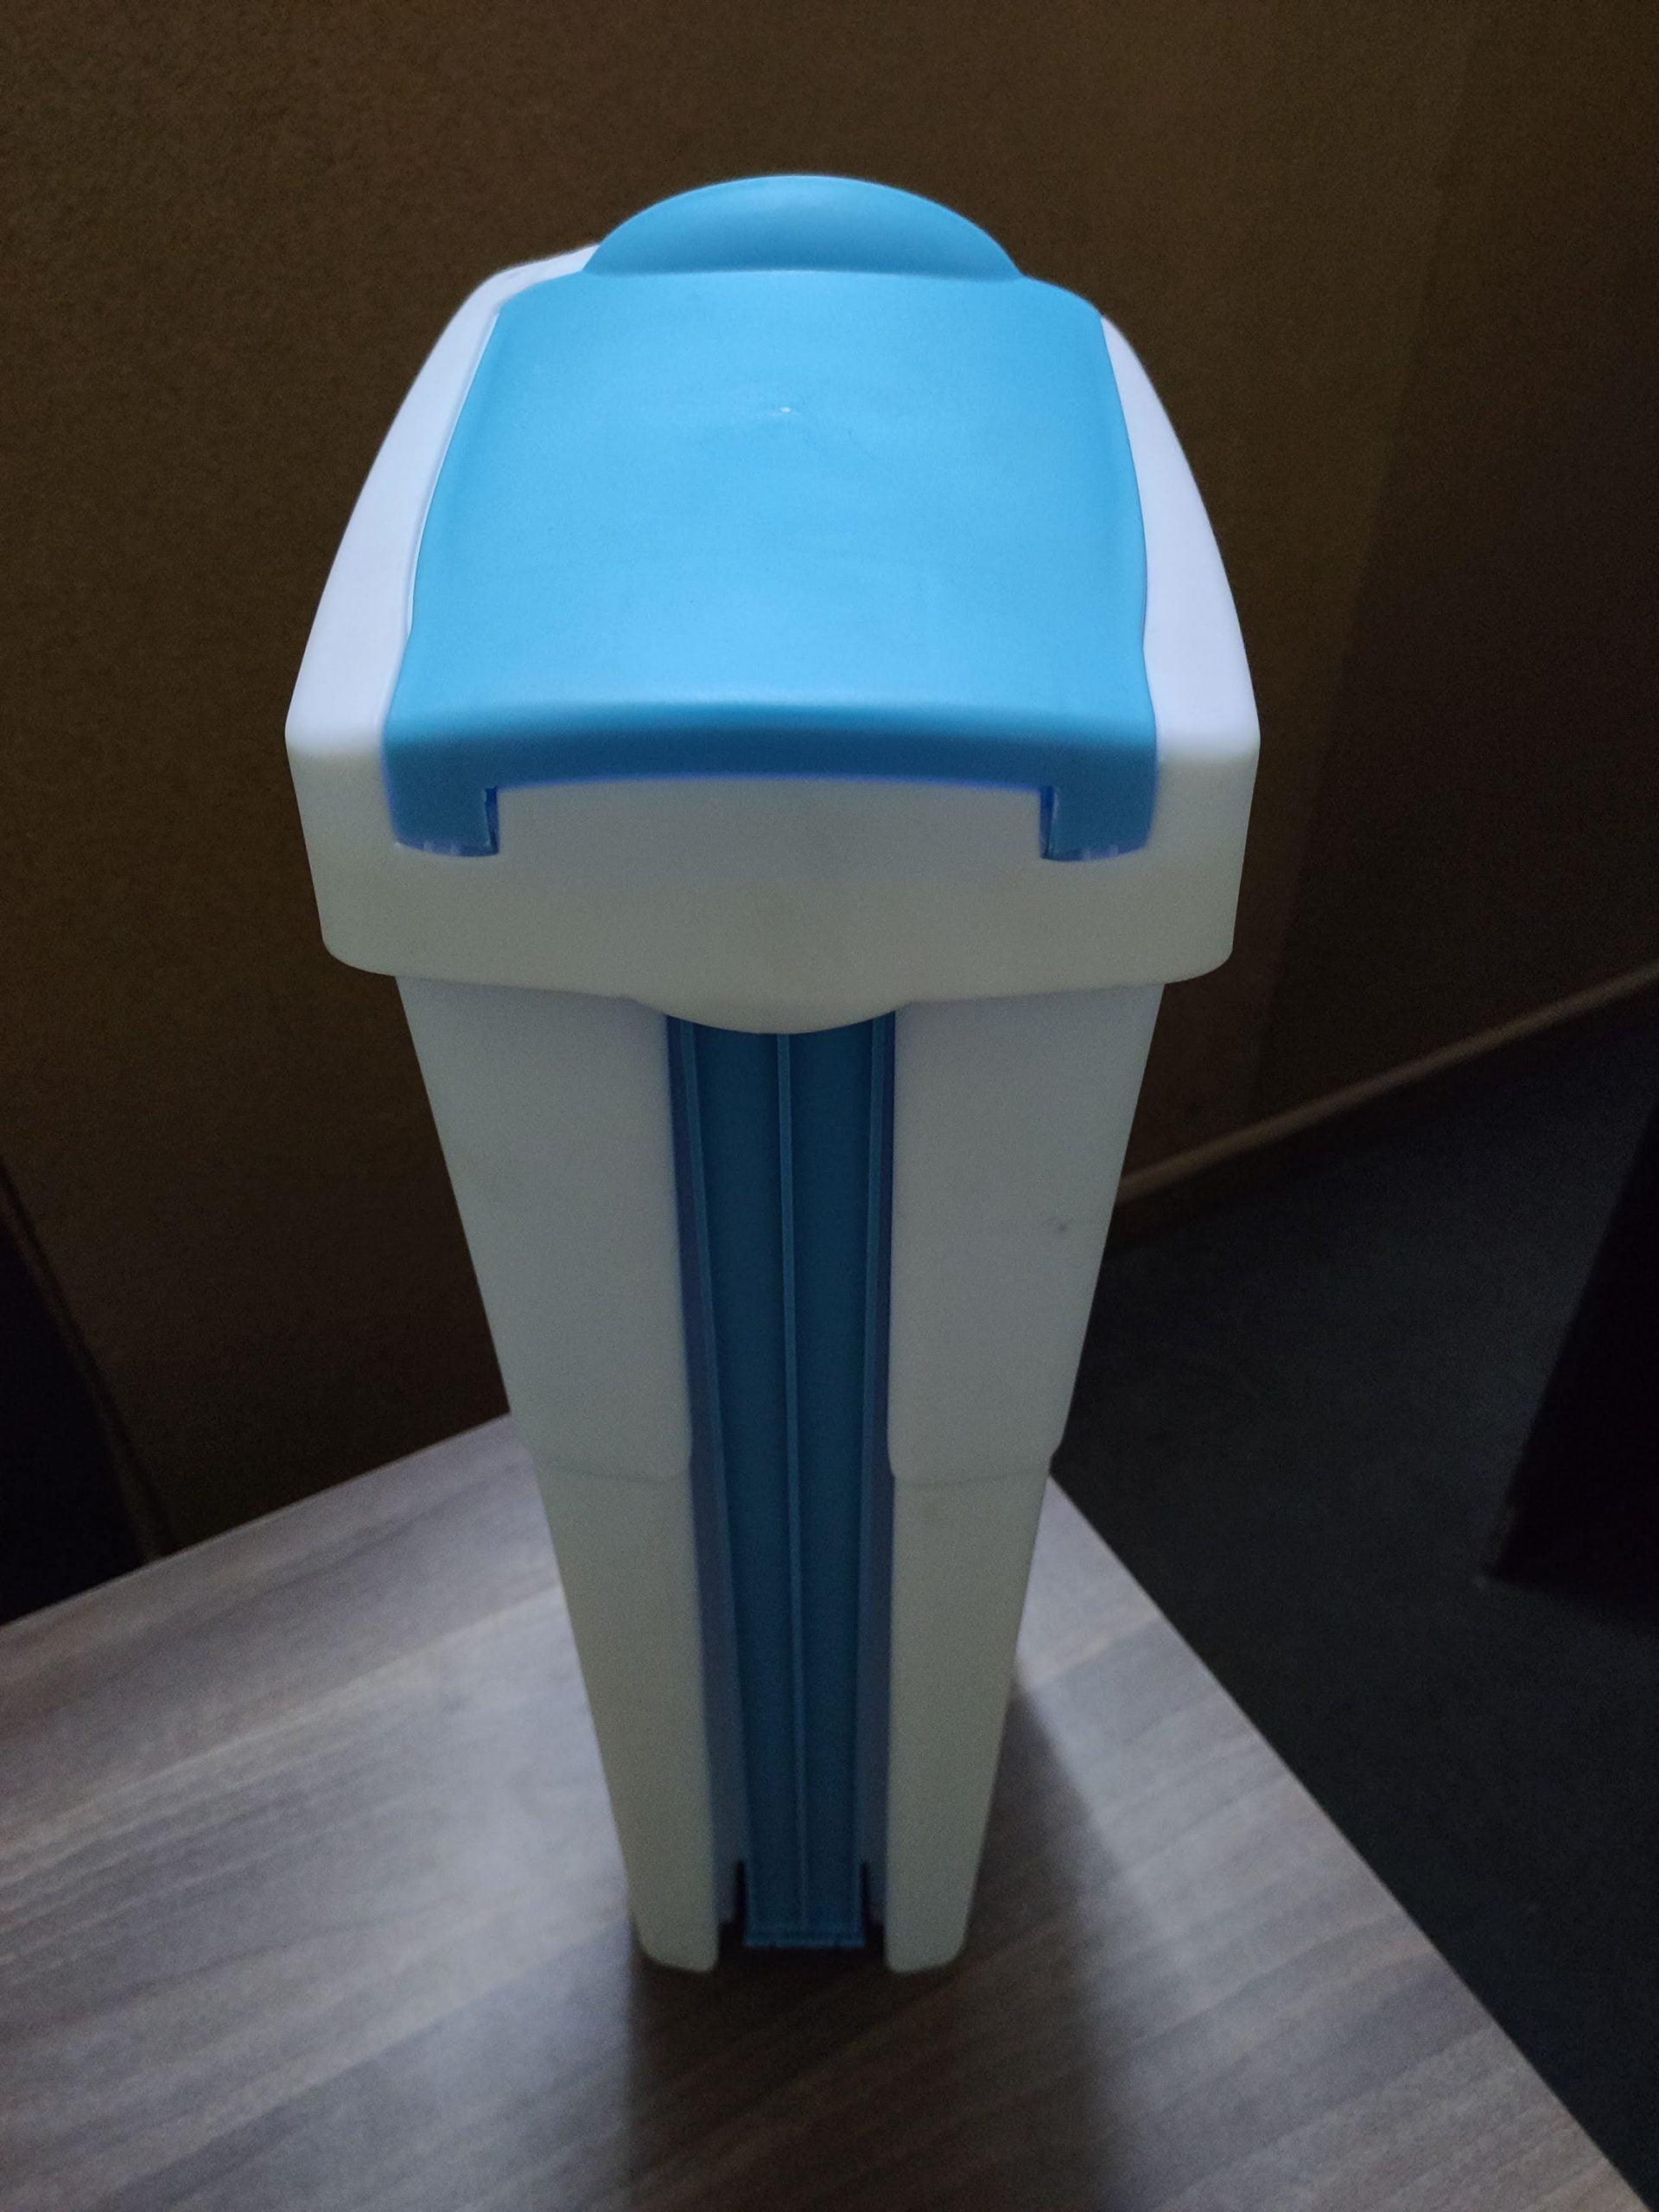 sanitary-bin-white-blue-2